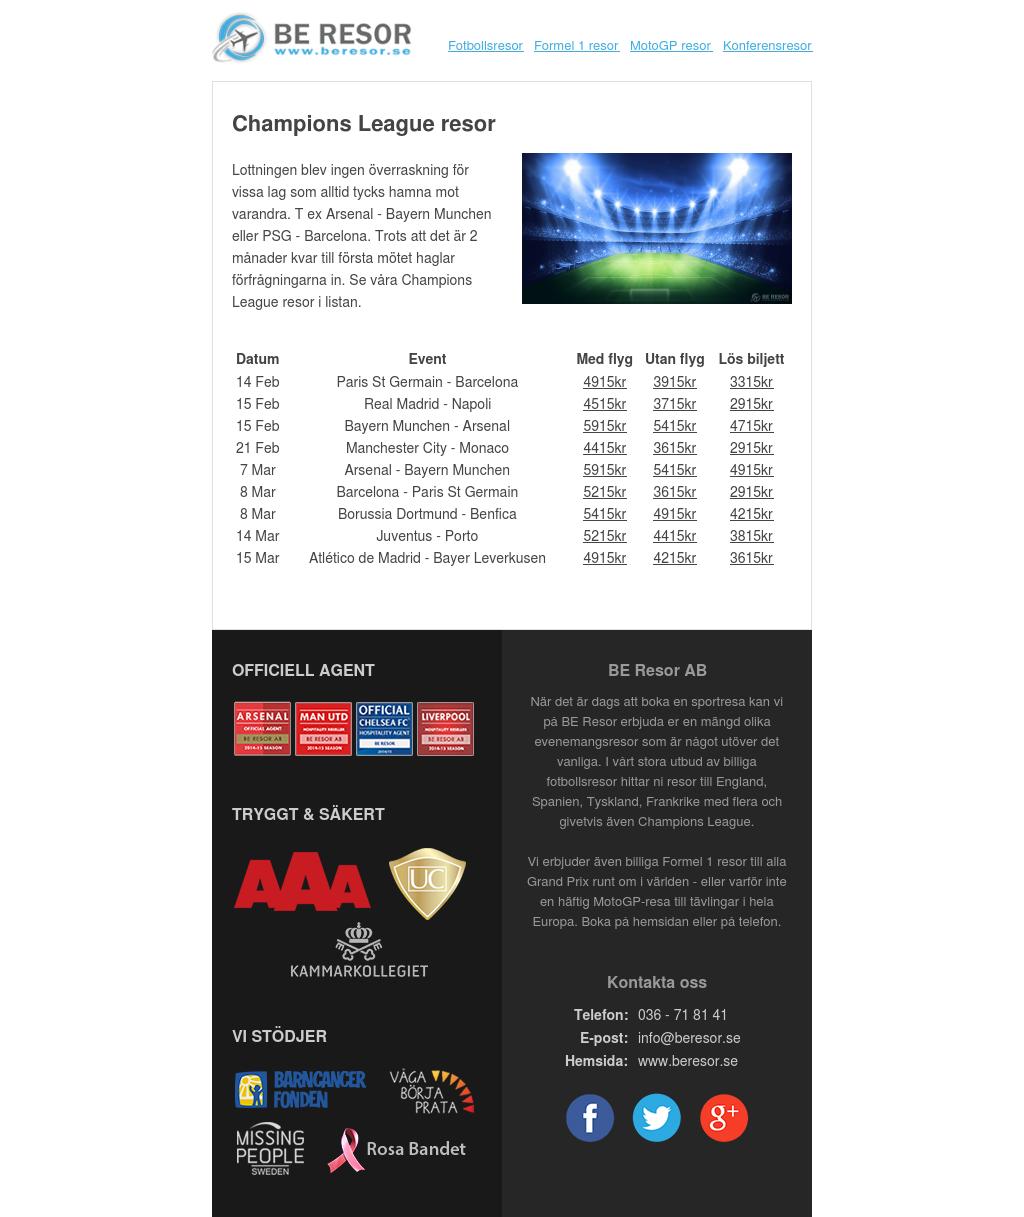 Champions League resor